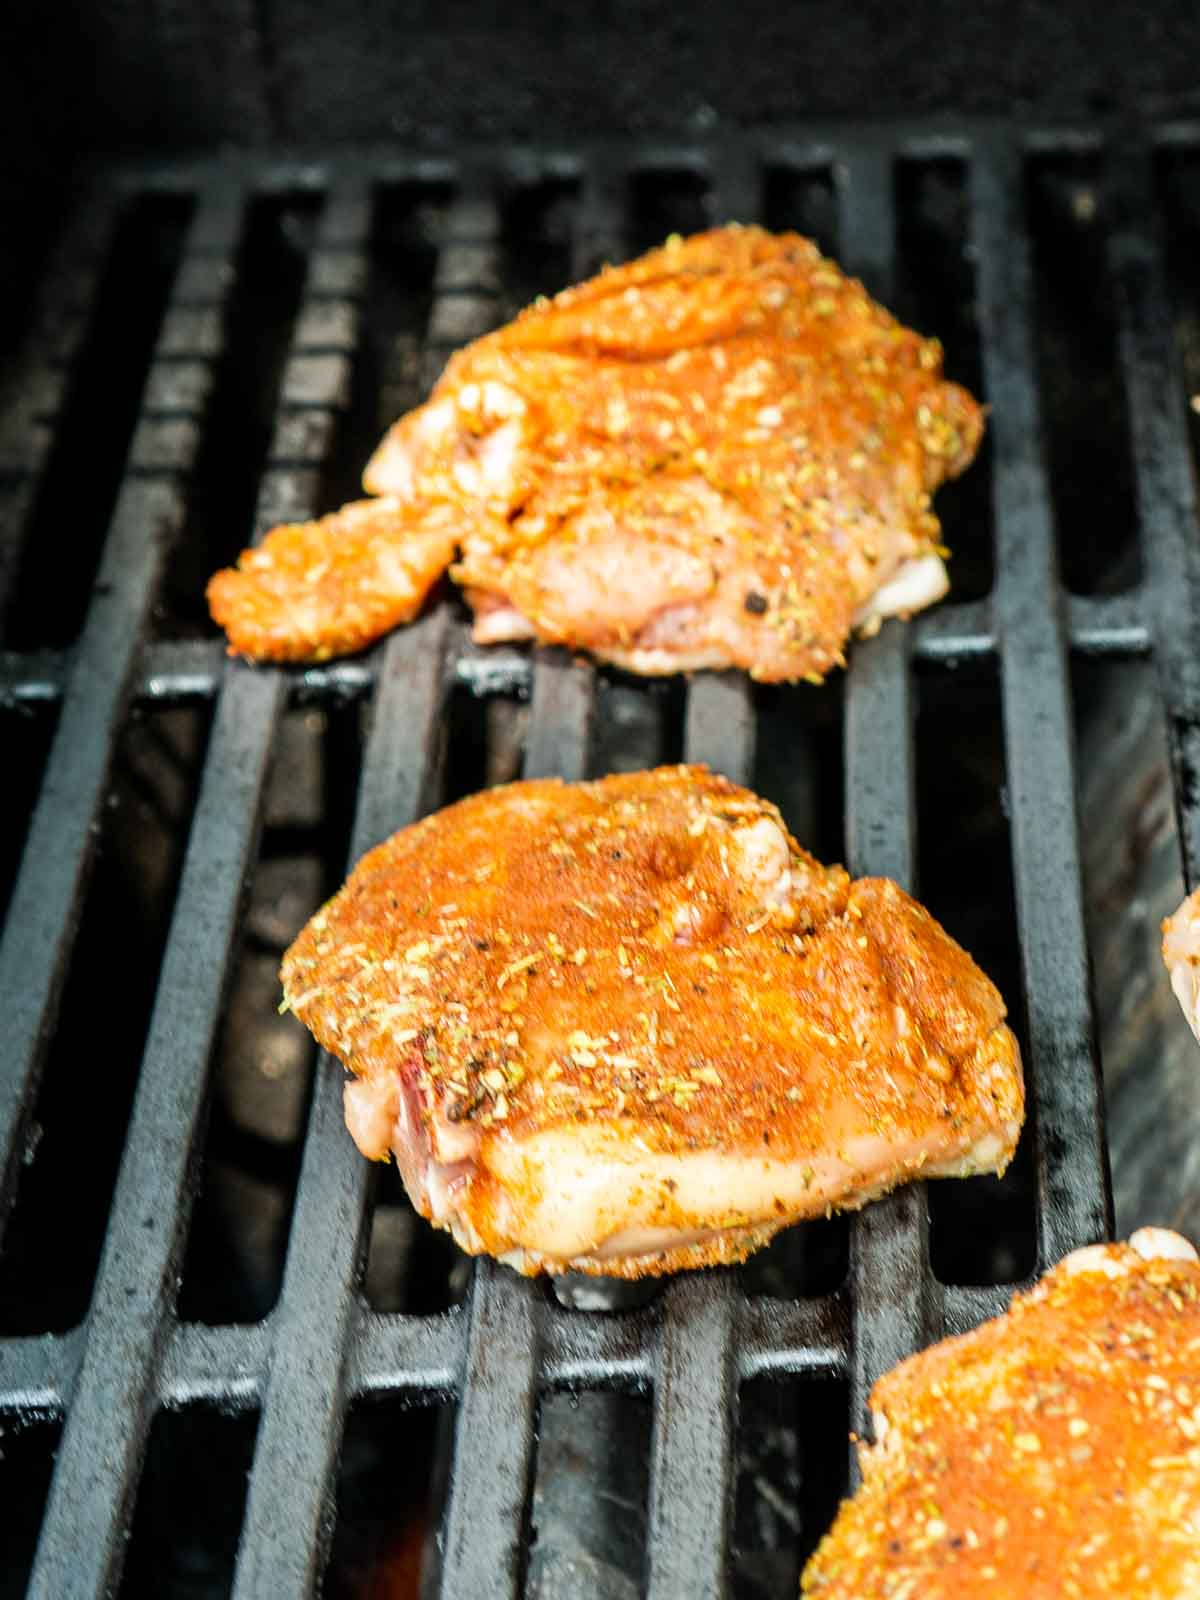 chicken skin side down on grill